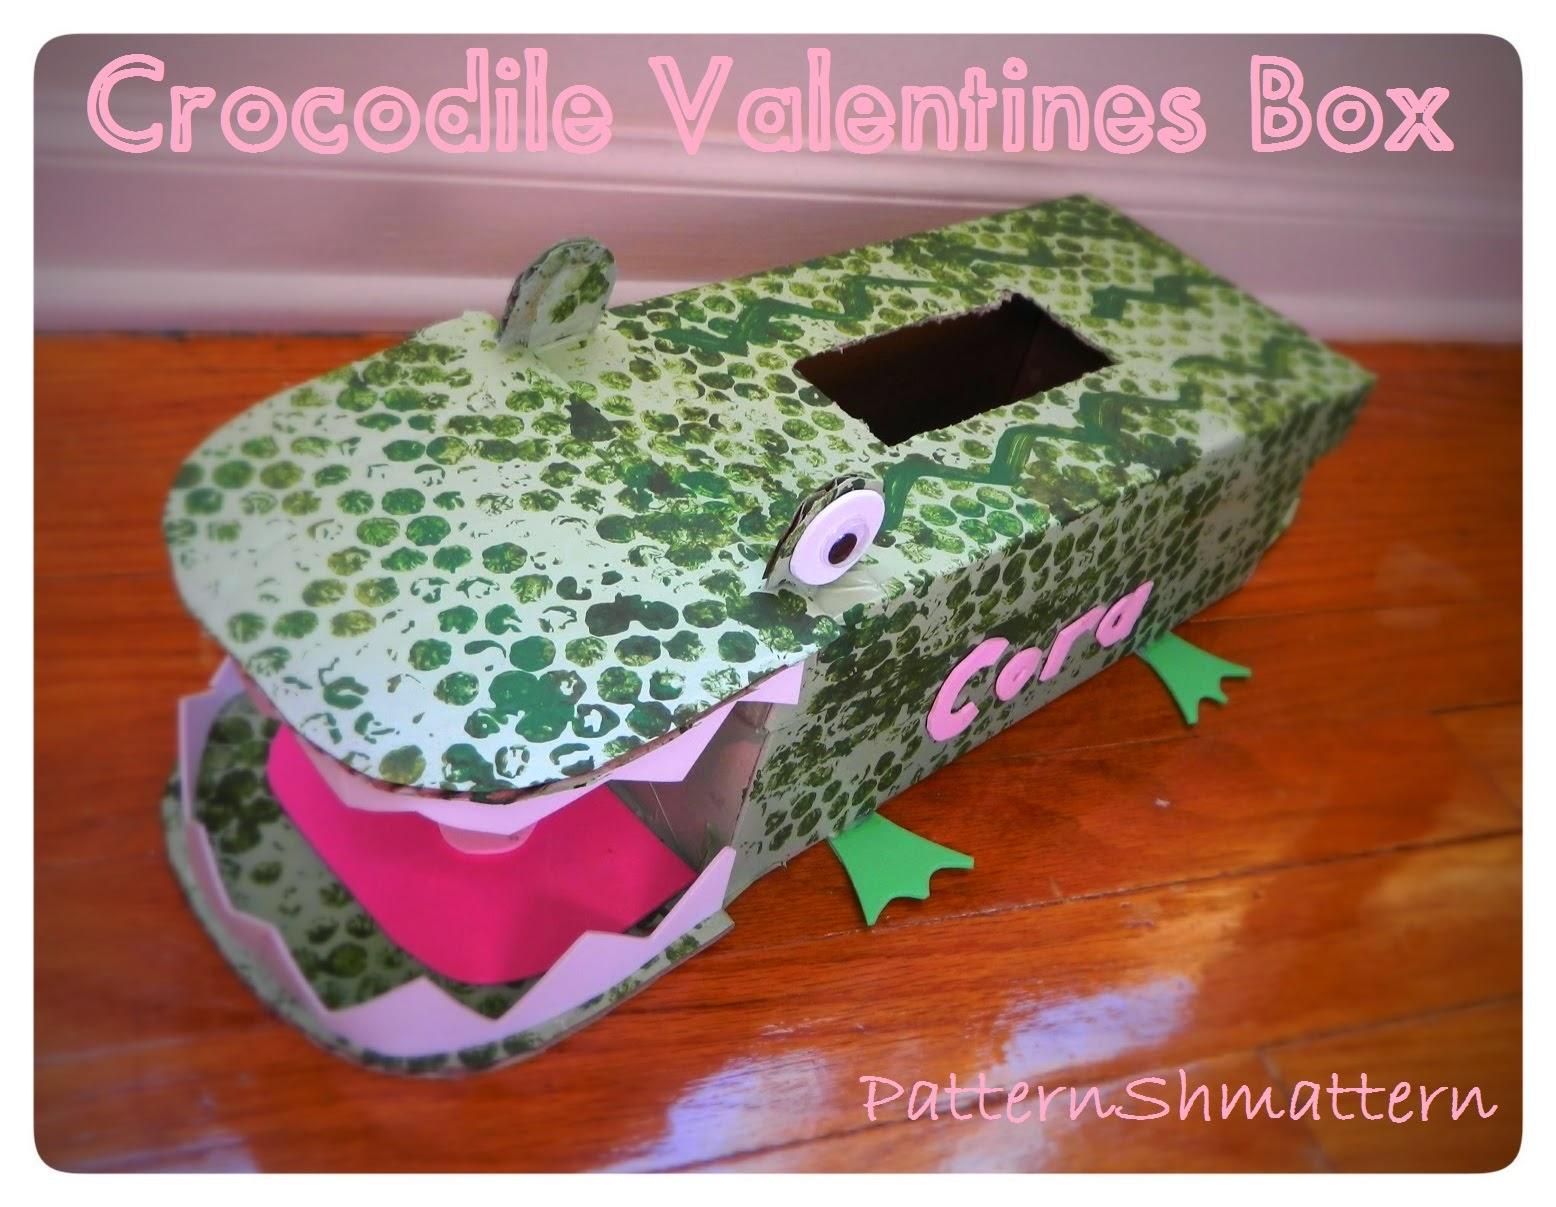 crocodile or alligator valentines and box